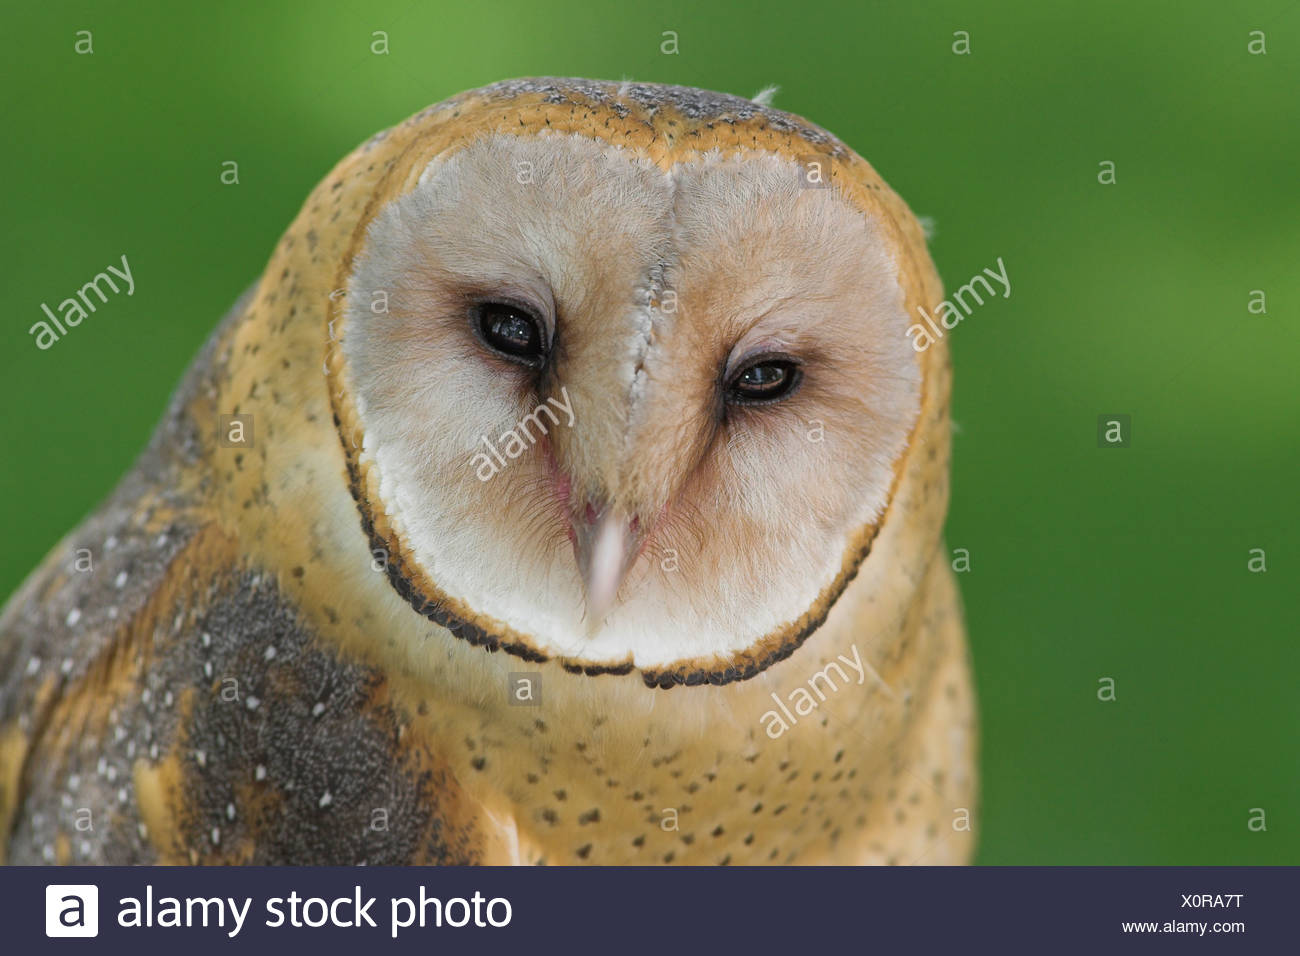 Barn Owl head detail, British Columbia, Canada. - Stock Image